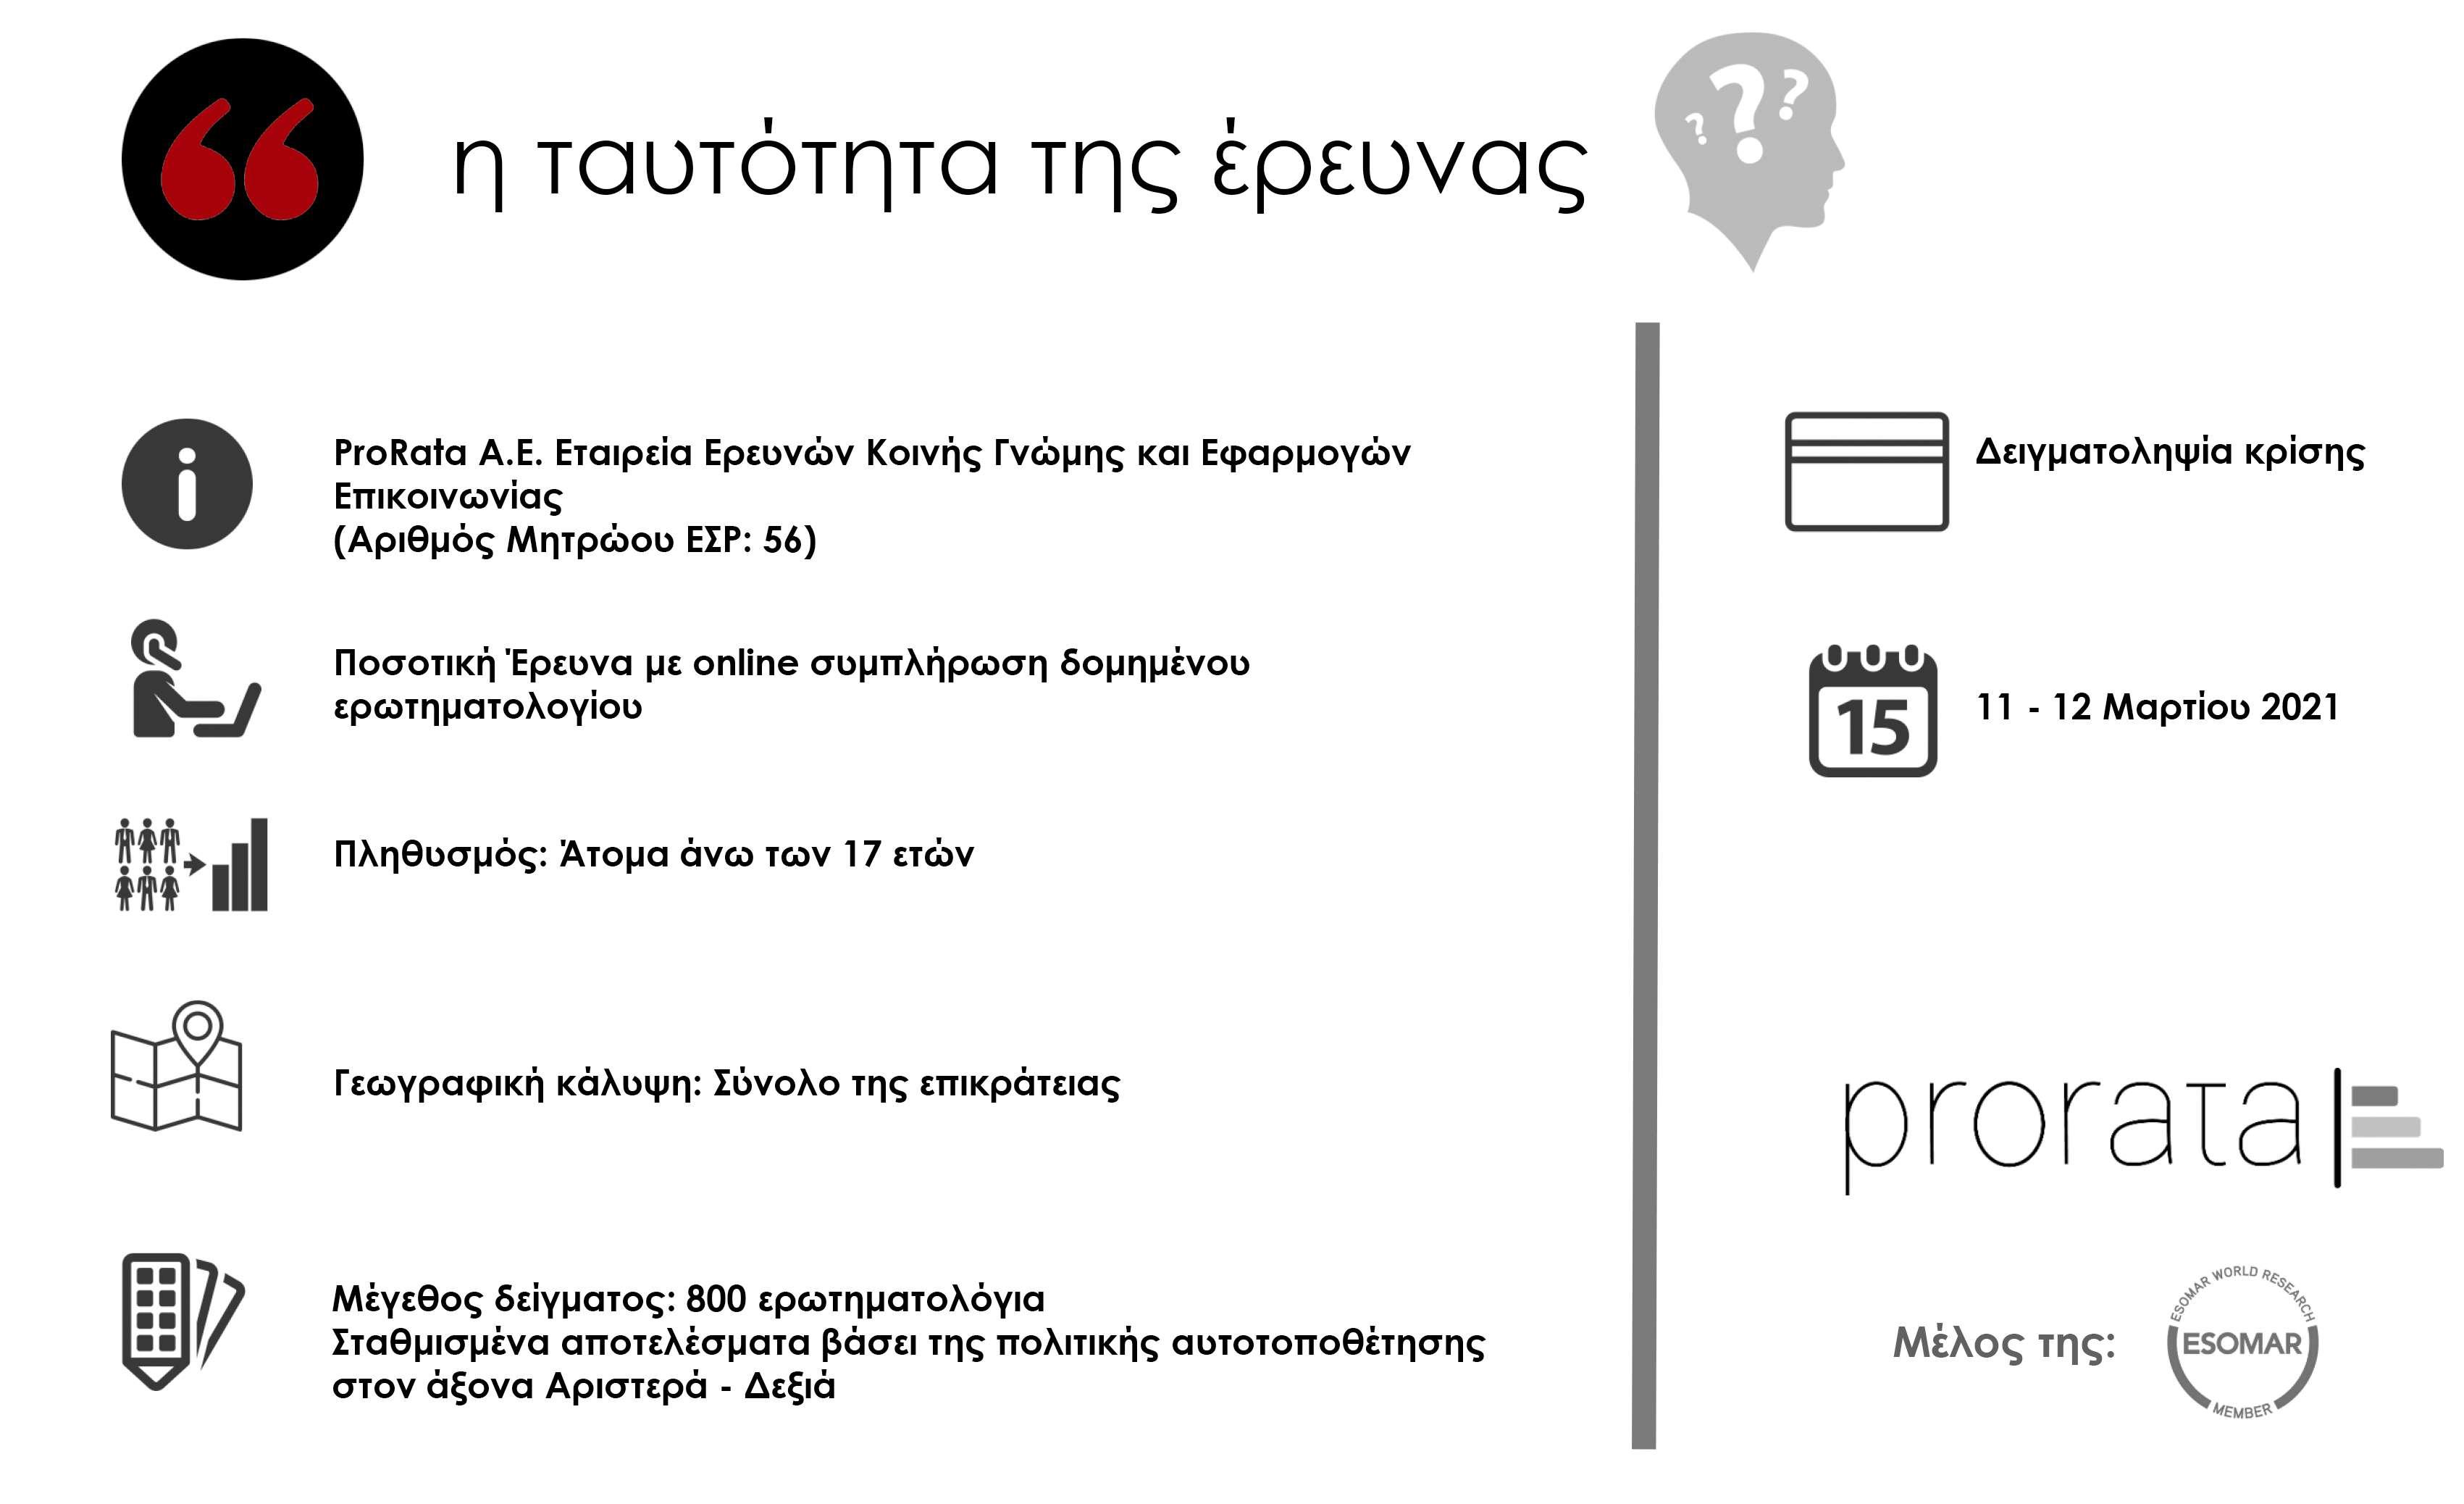 Prorata Ελληνική Αστυνομία Ταυτότητα έρευνας